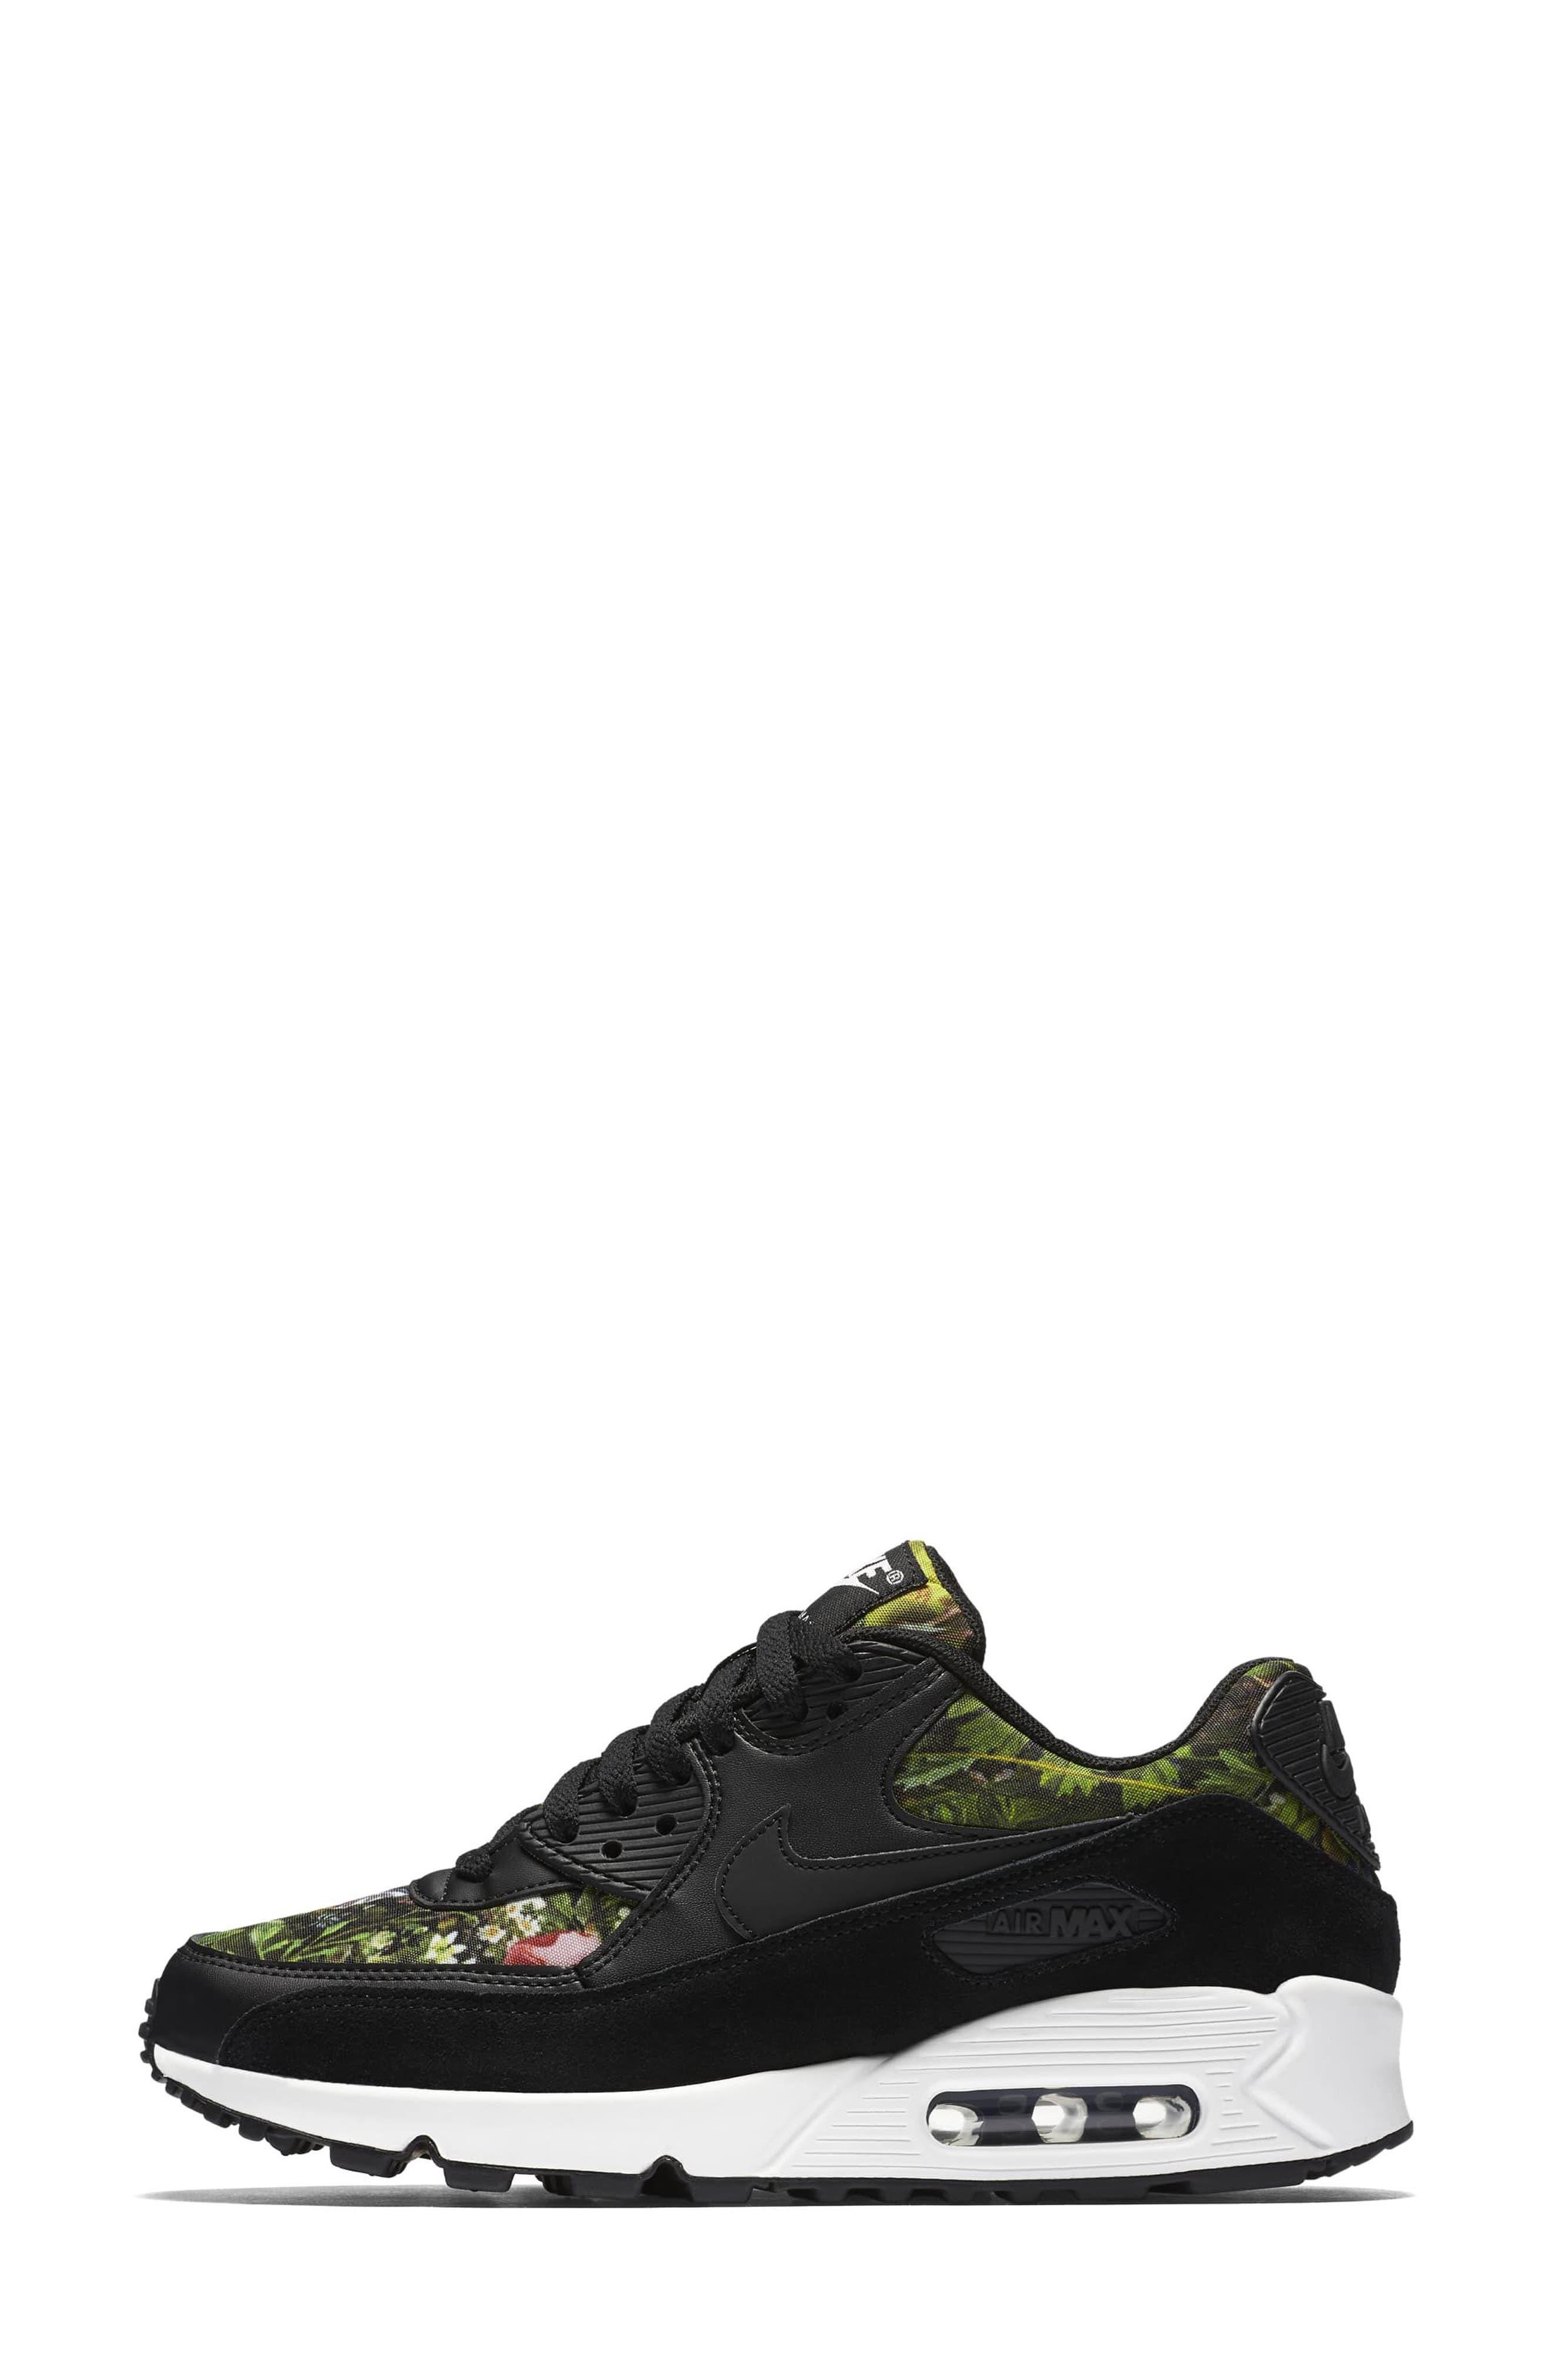 Air Max 90 SE Sneaker,                             Alternate thumbnail 22, color,